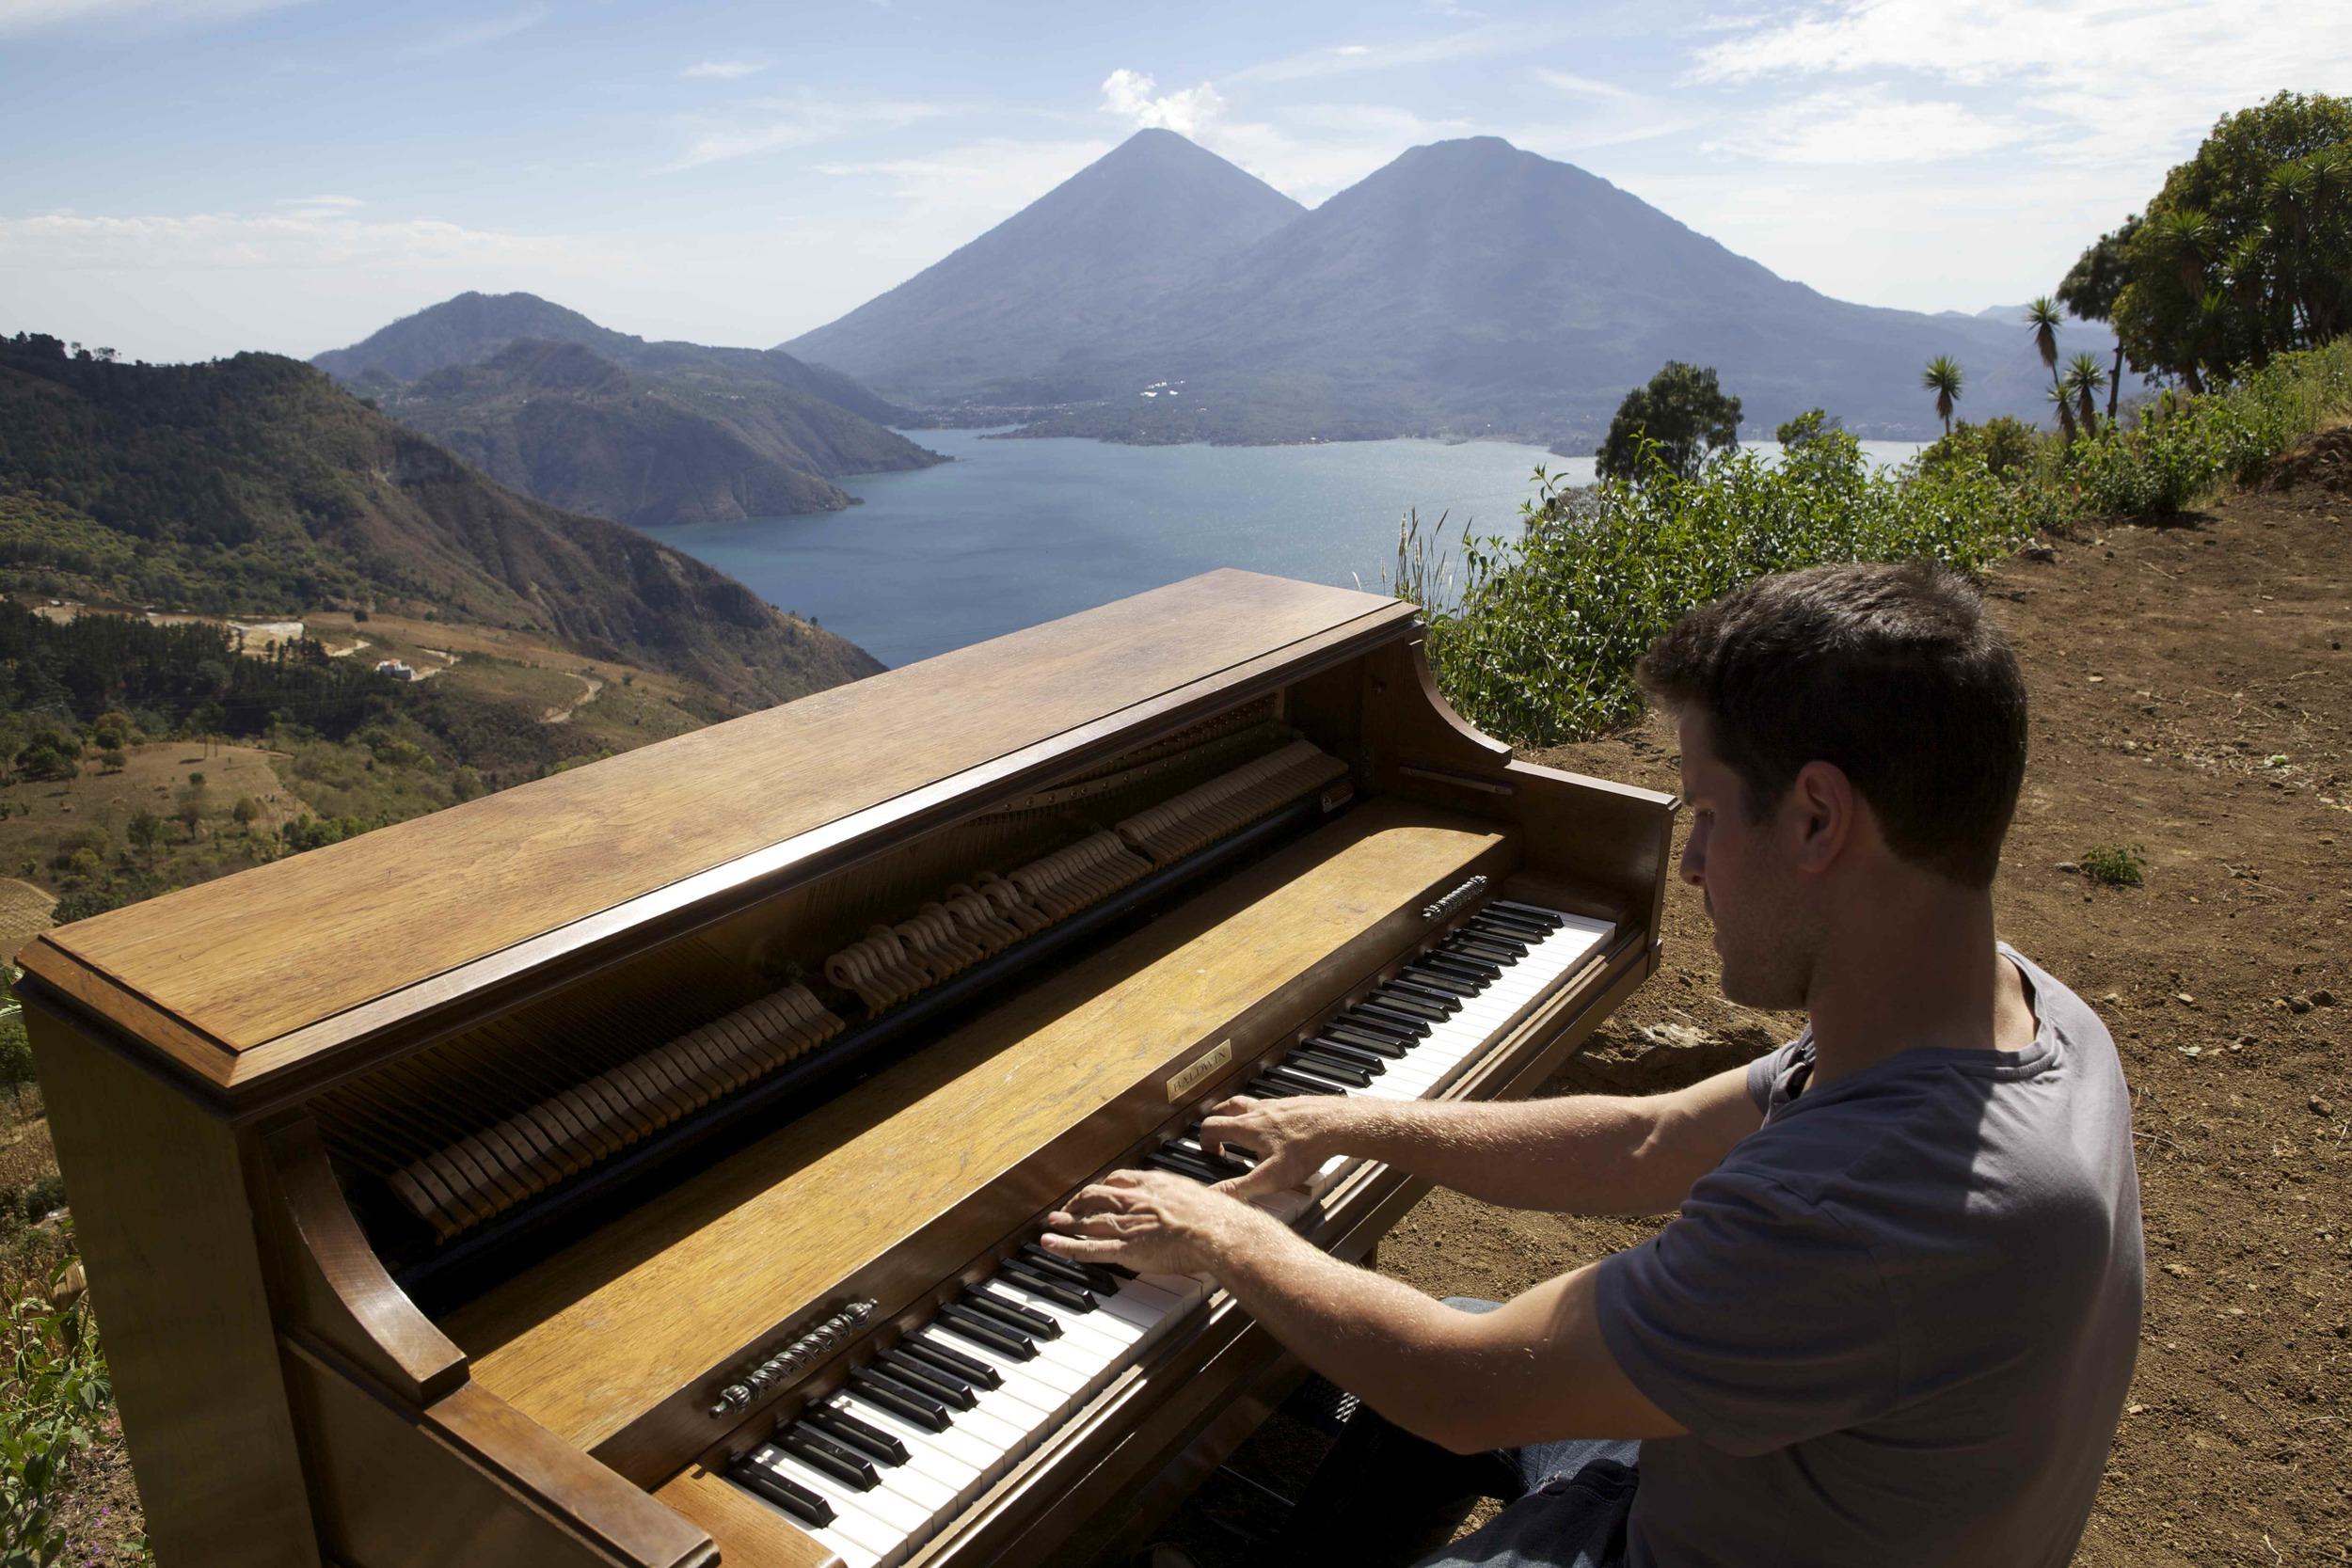 dotan negrin play me im yours public street piano